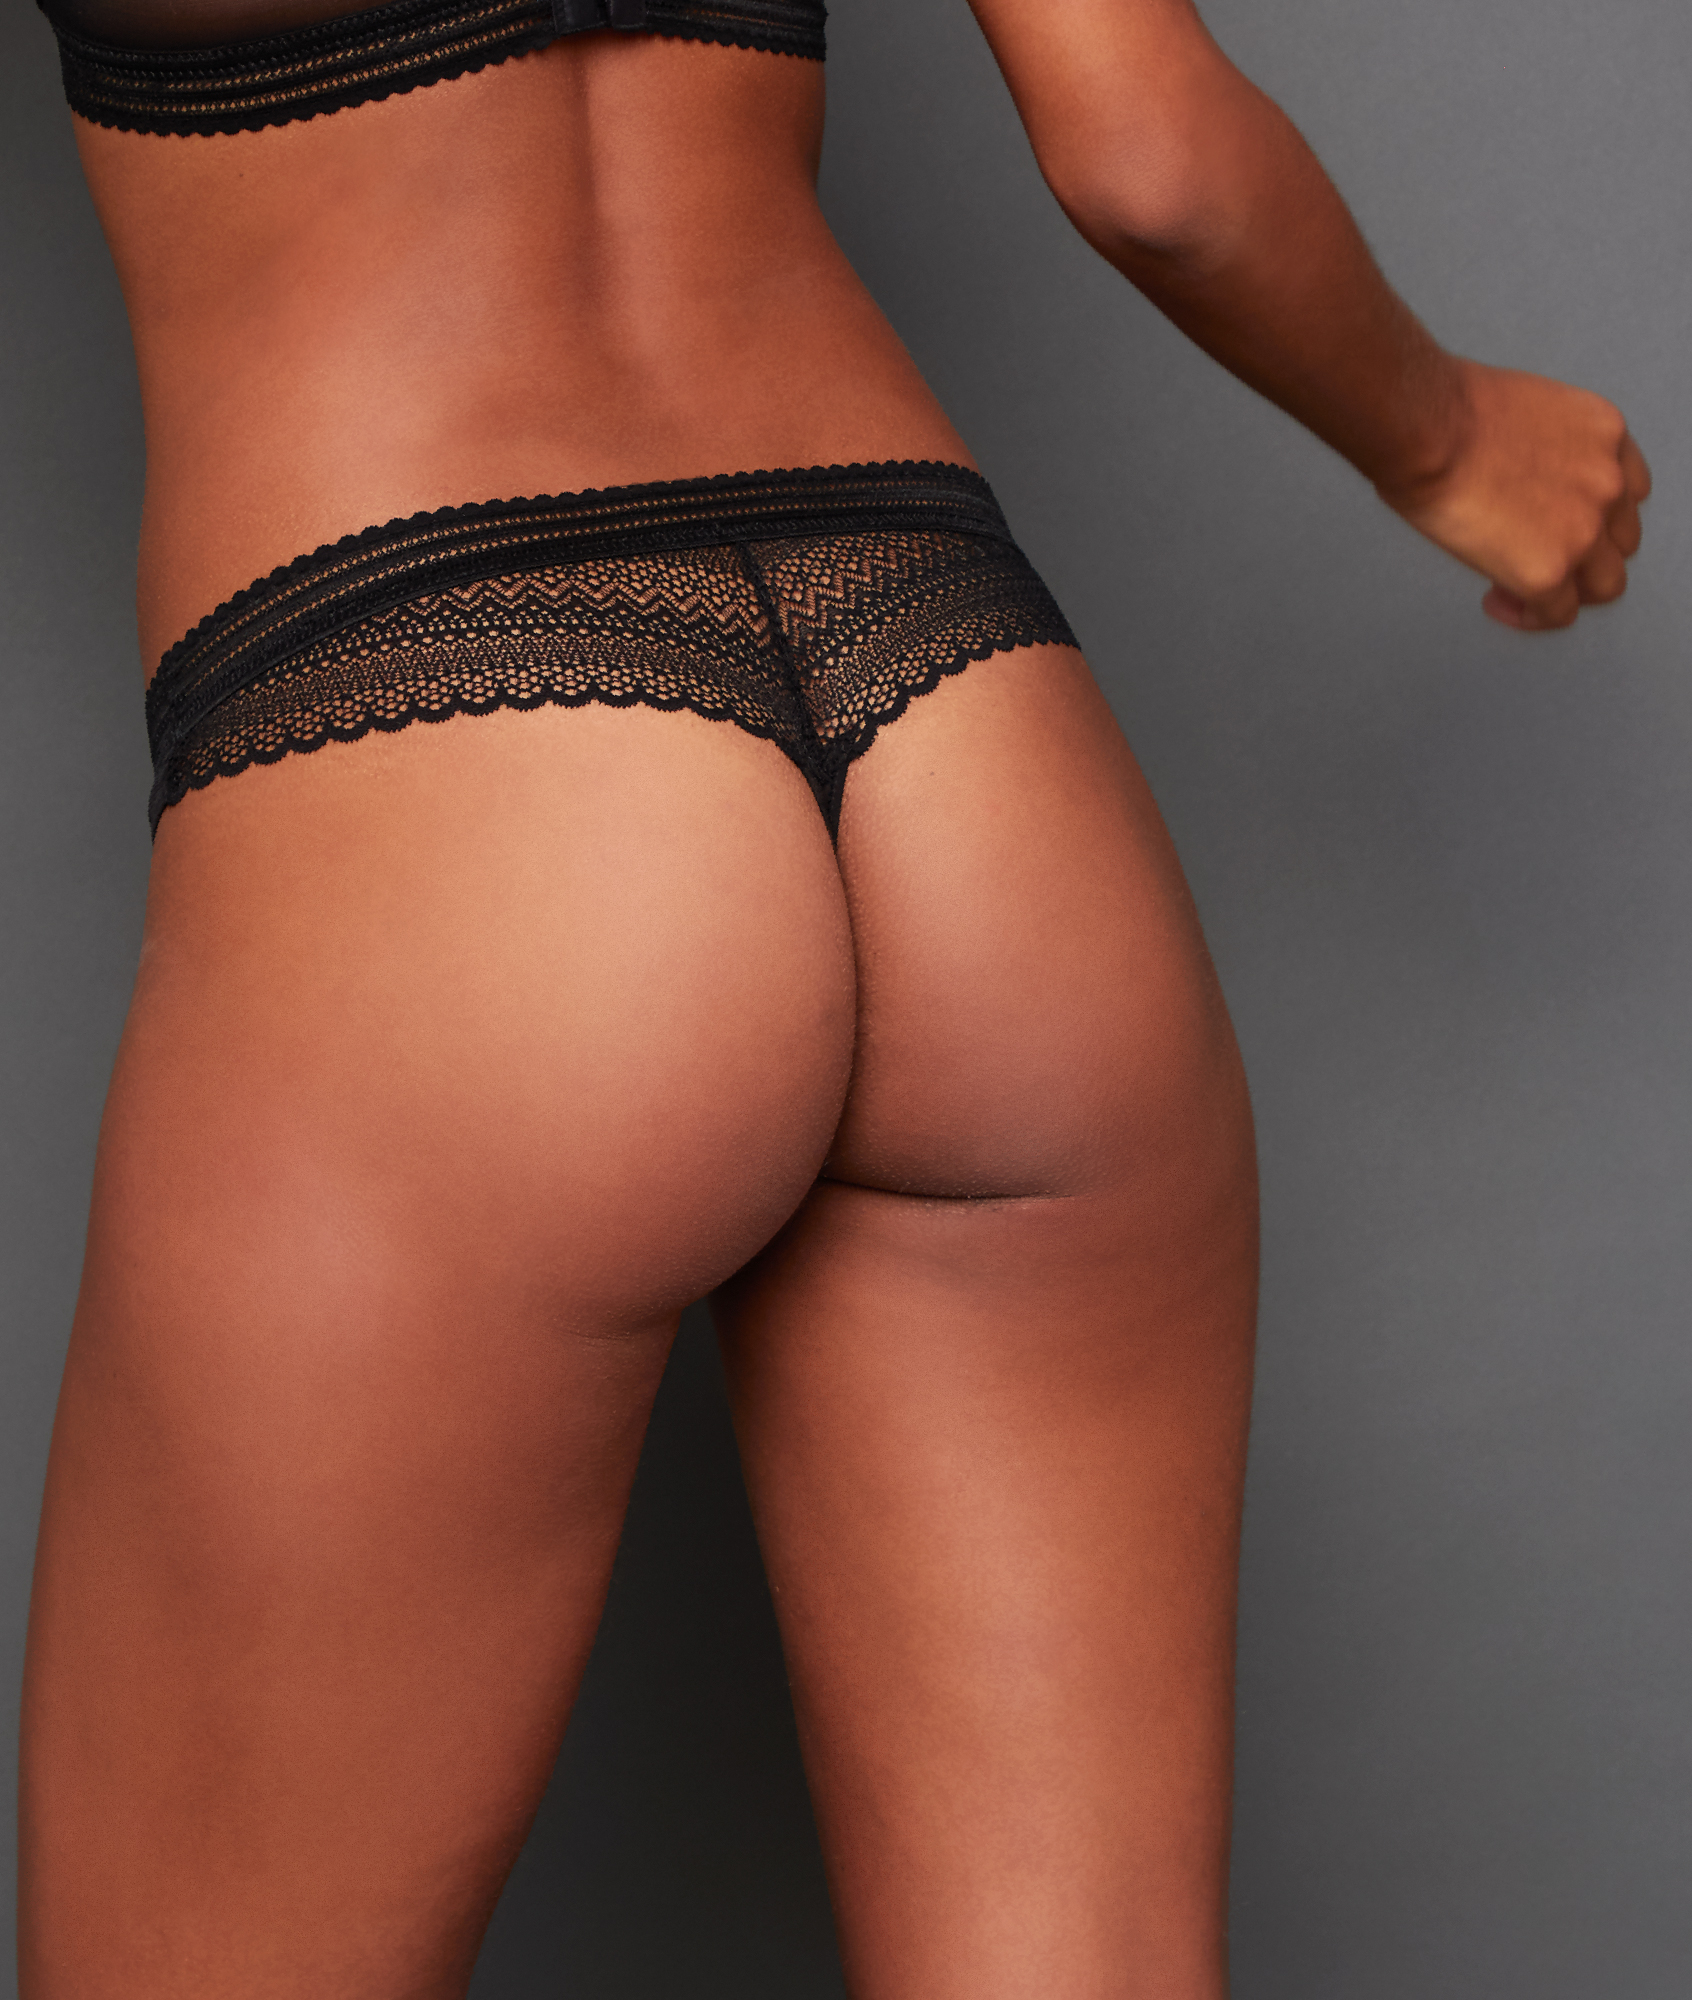 Koronkowe majtki typu tanga noir.